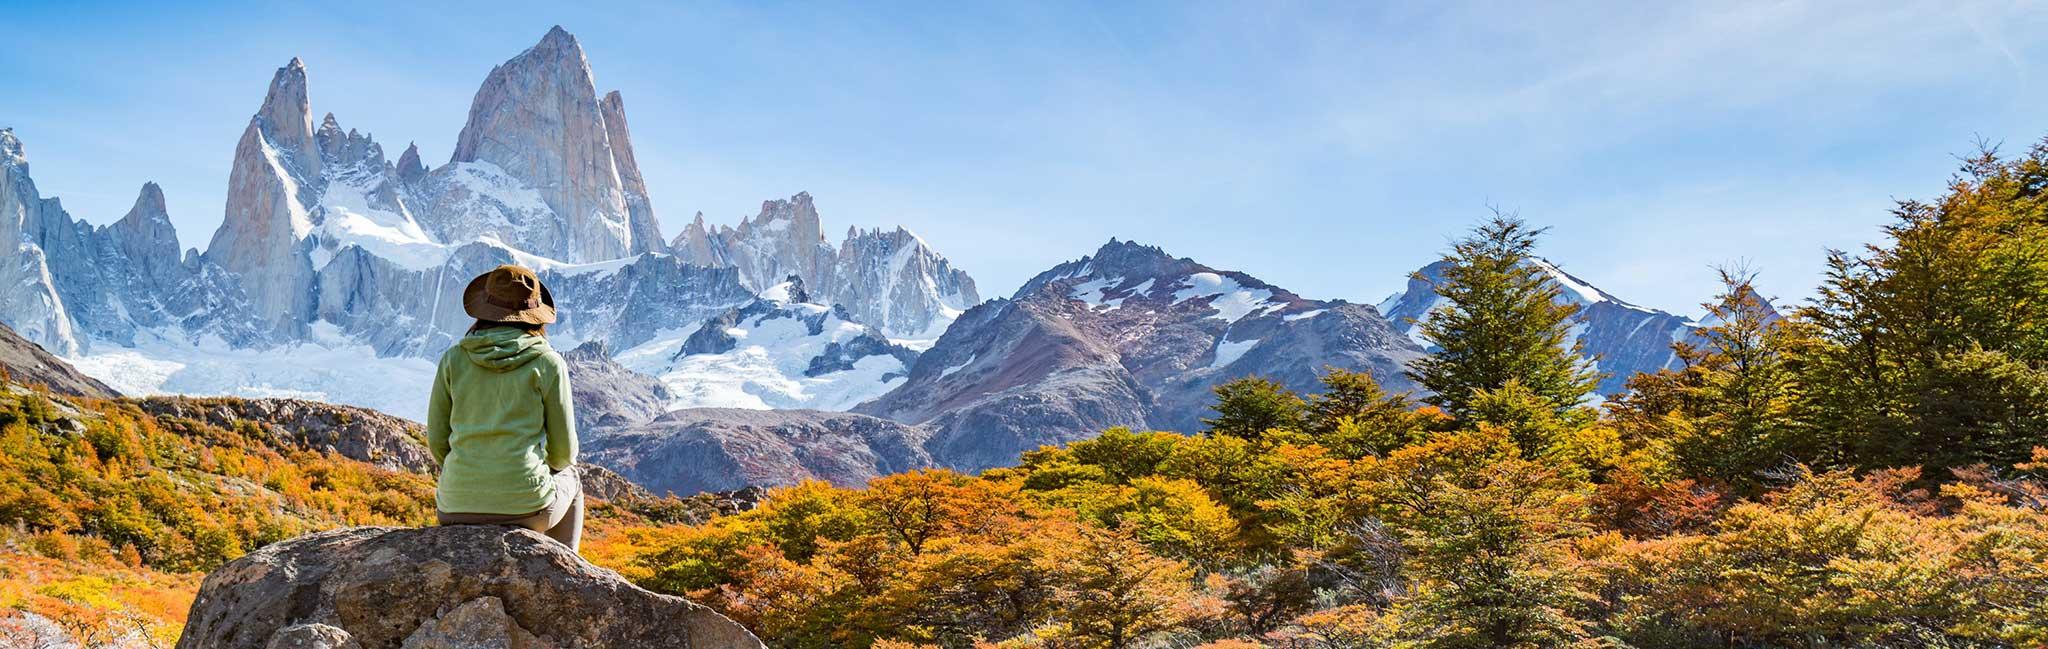 South America Tour - Mountain Views in Patagonia